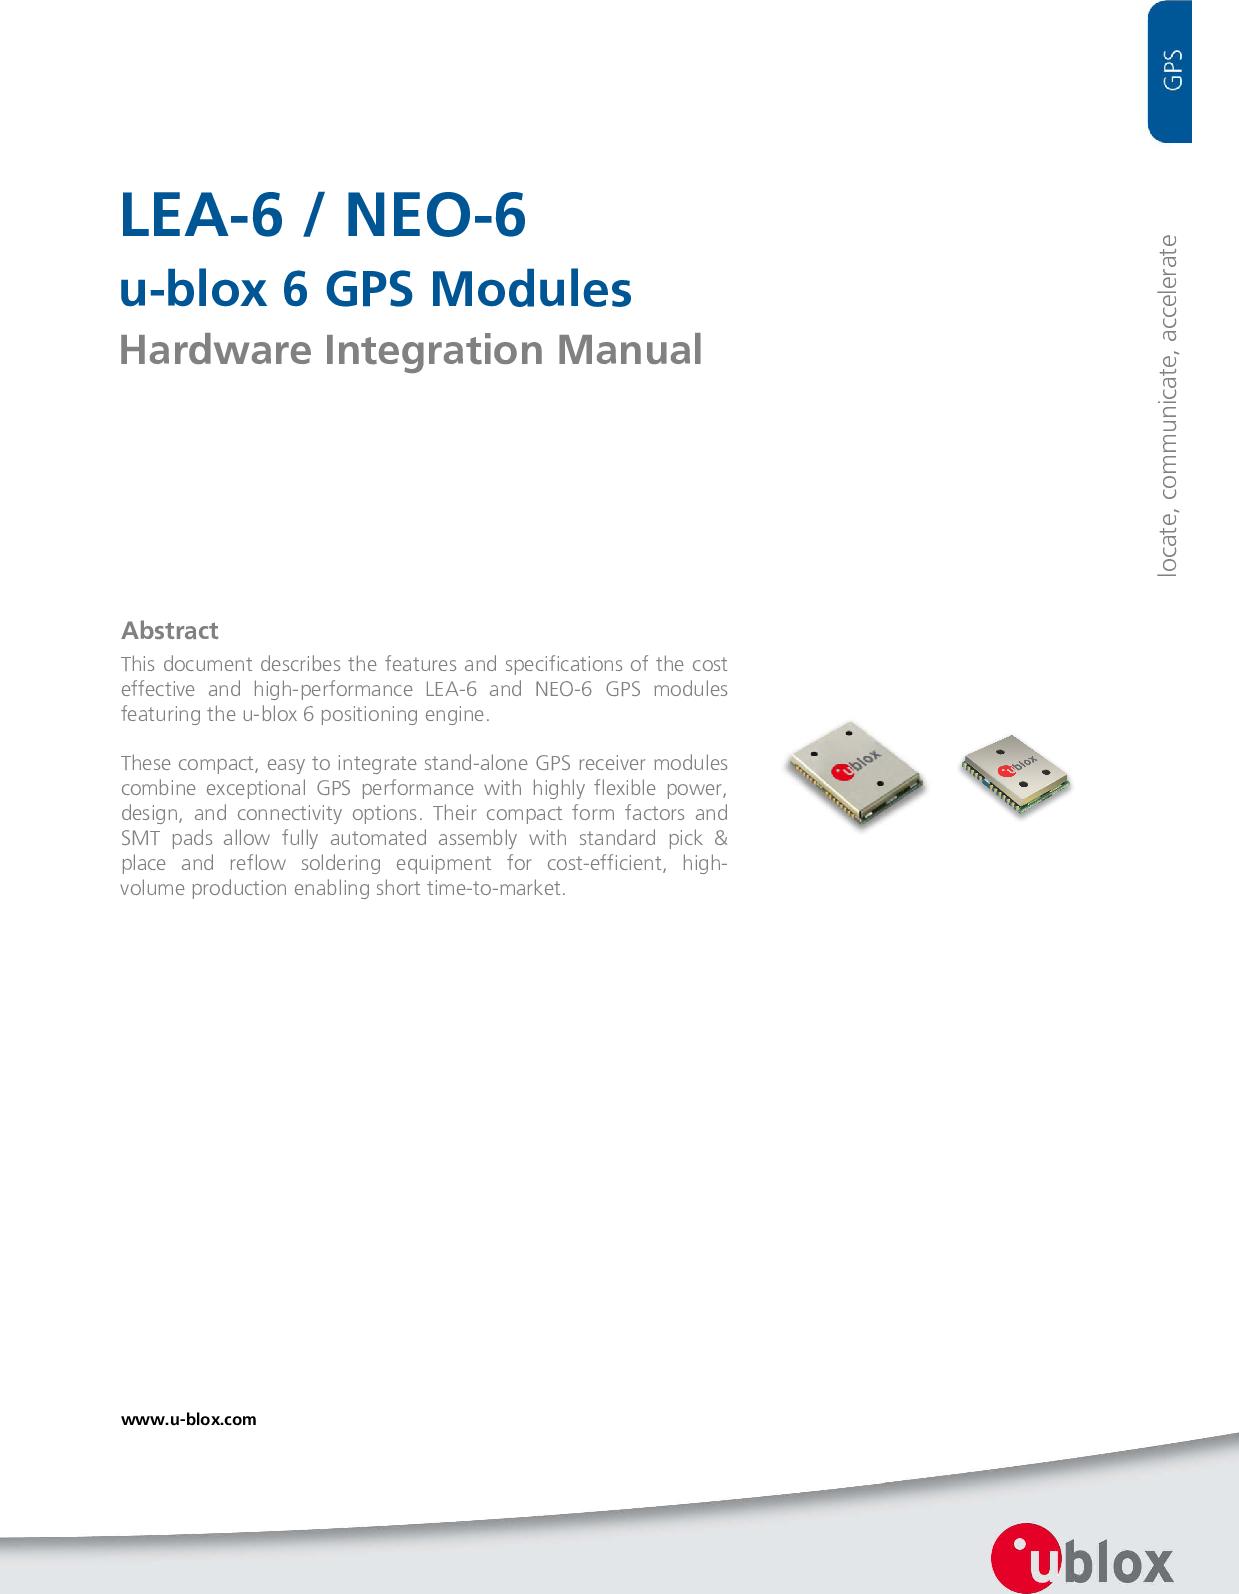 LEA 6 / NEO UBLOX GPS Hardware Integration Manual